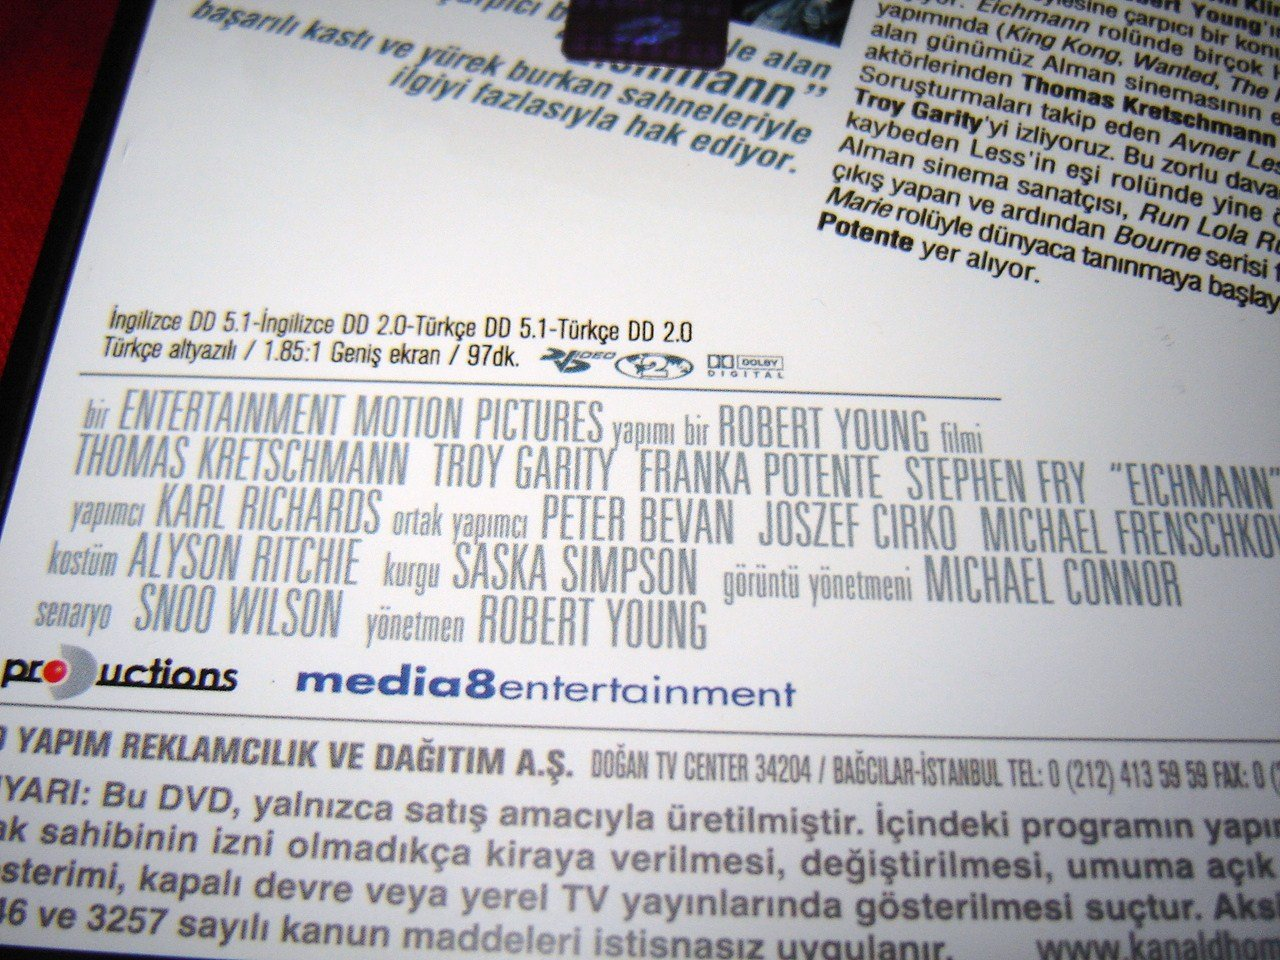 Tv Dvd Kast.Amazon Com Eichmann Thomas Kretschmann Troy Garity Franka